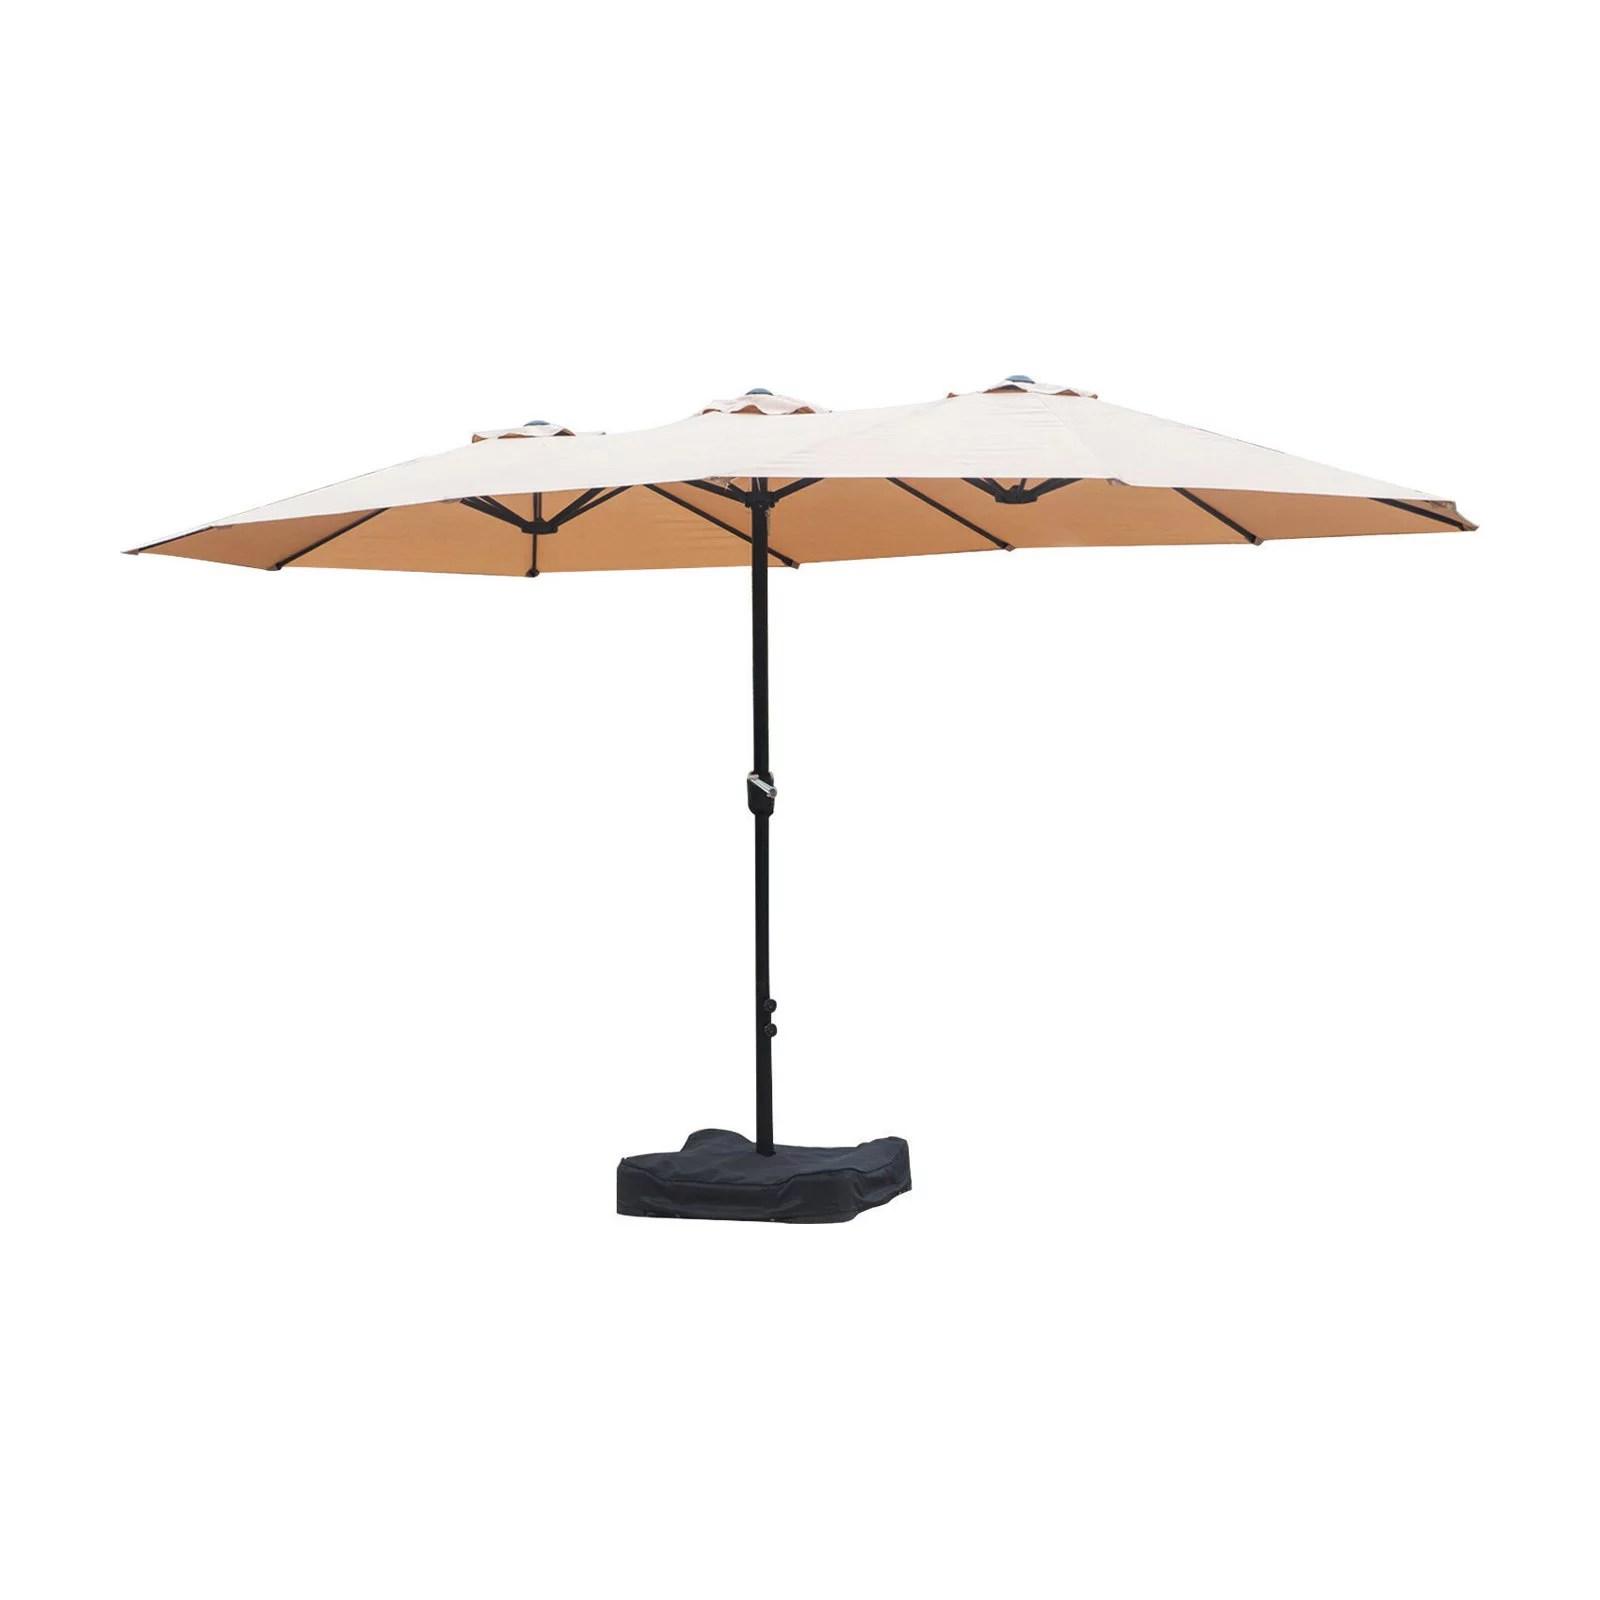 living accents 15 1 ft steel triple canopy patio umbrella with tilt walmart com